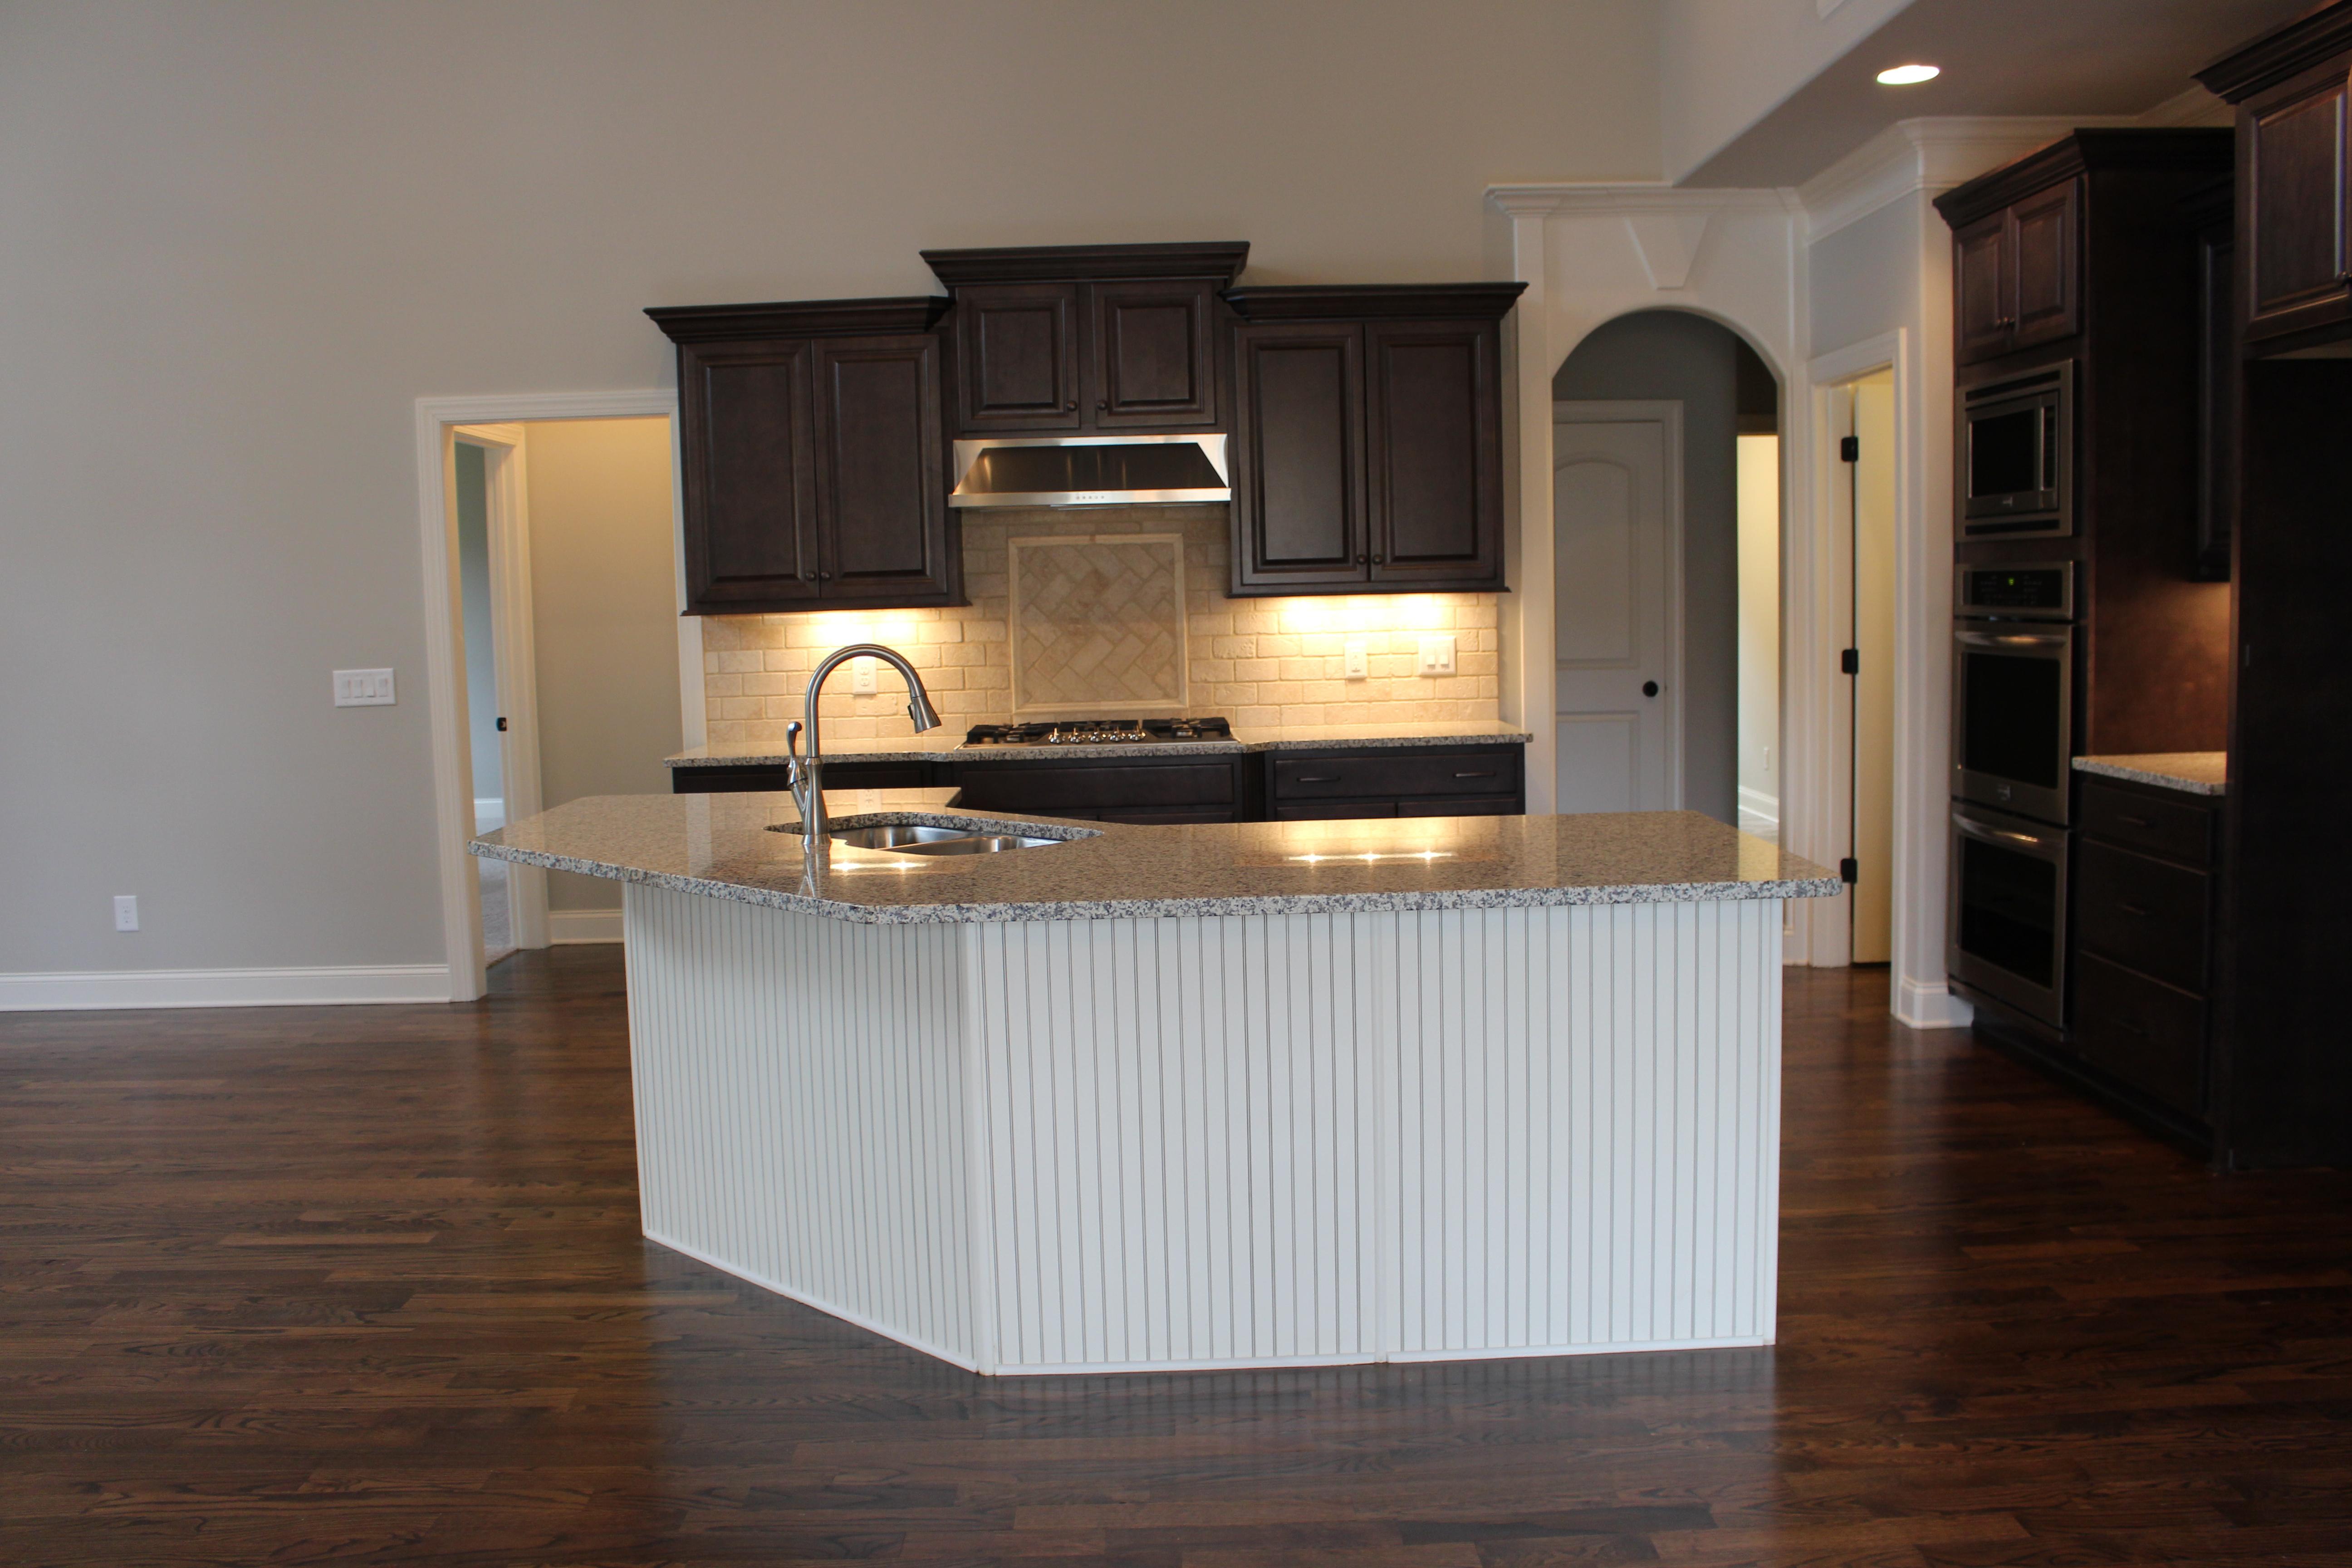 194AB kitchen from breakfast area